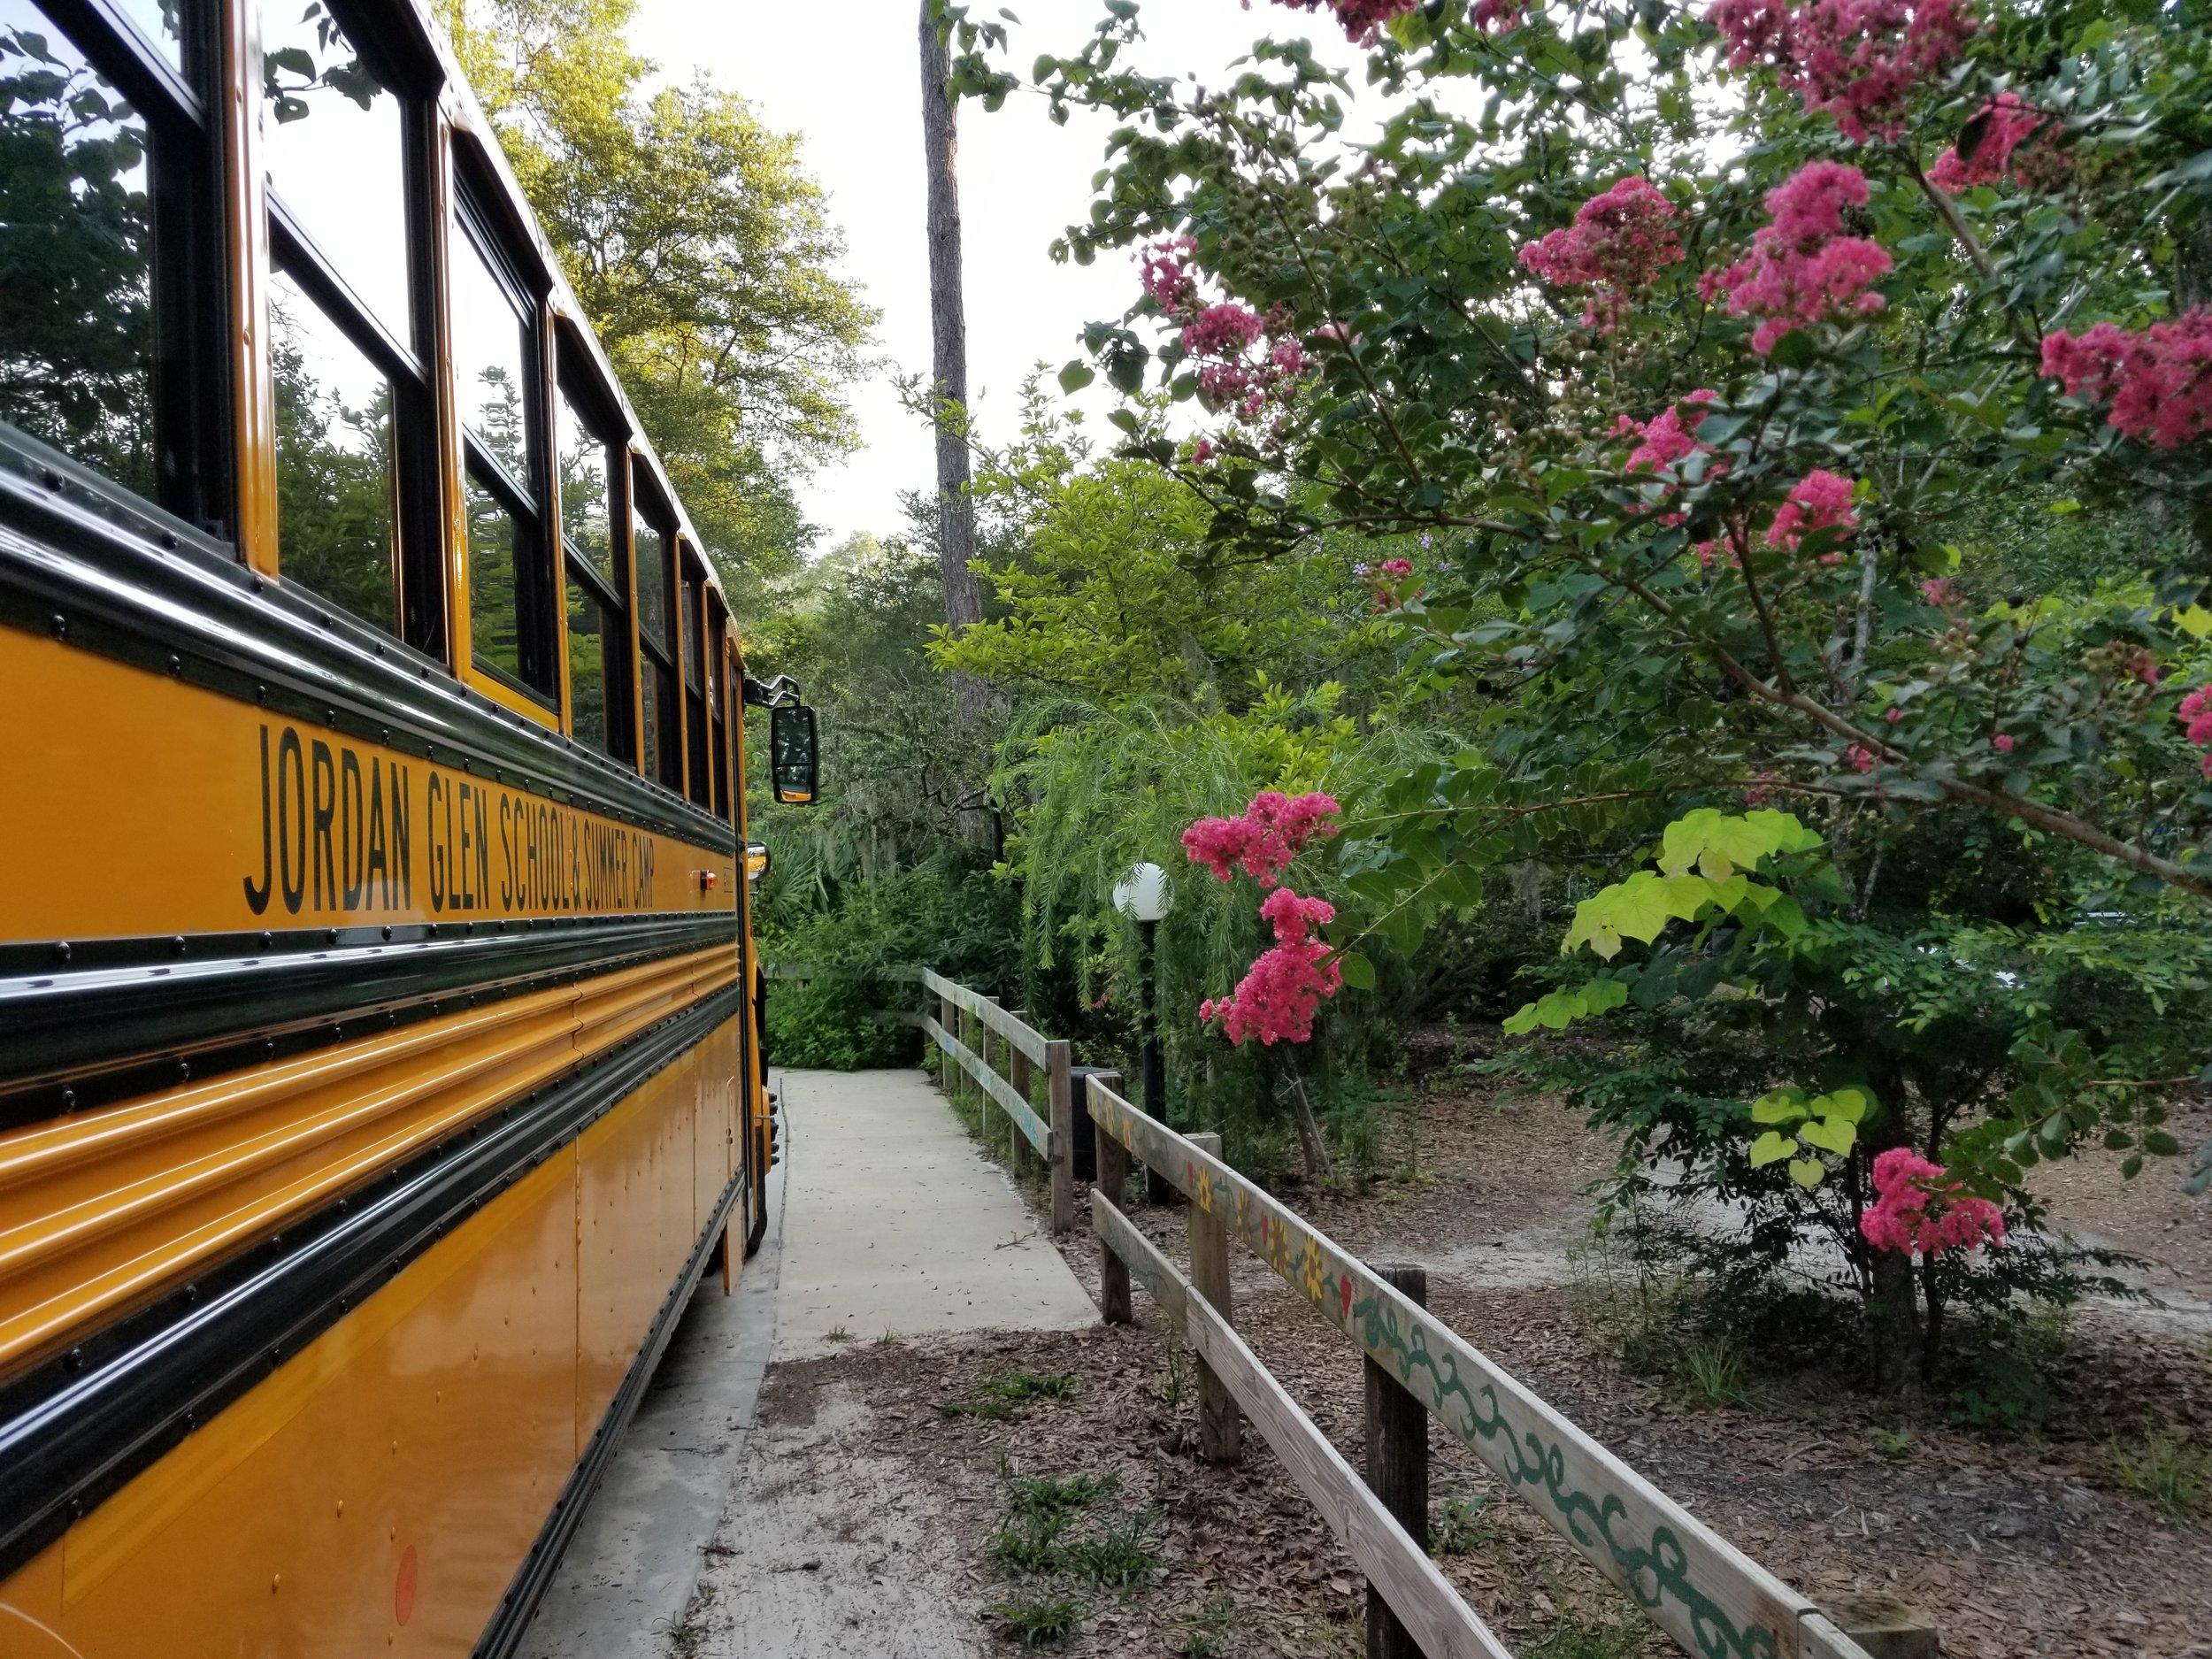 Jordan Glen School & Summer Camp - bus